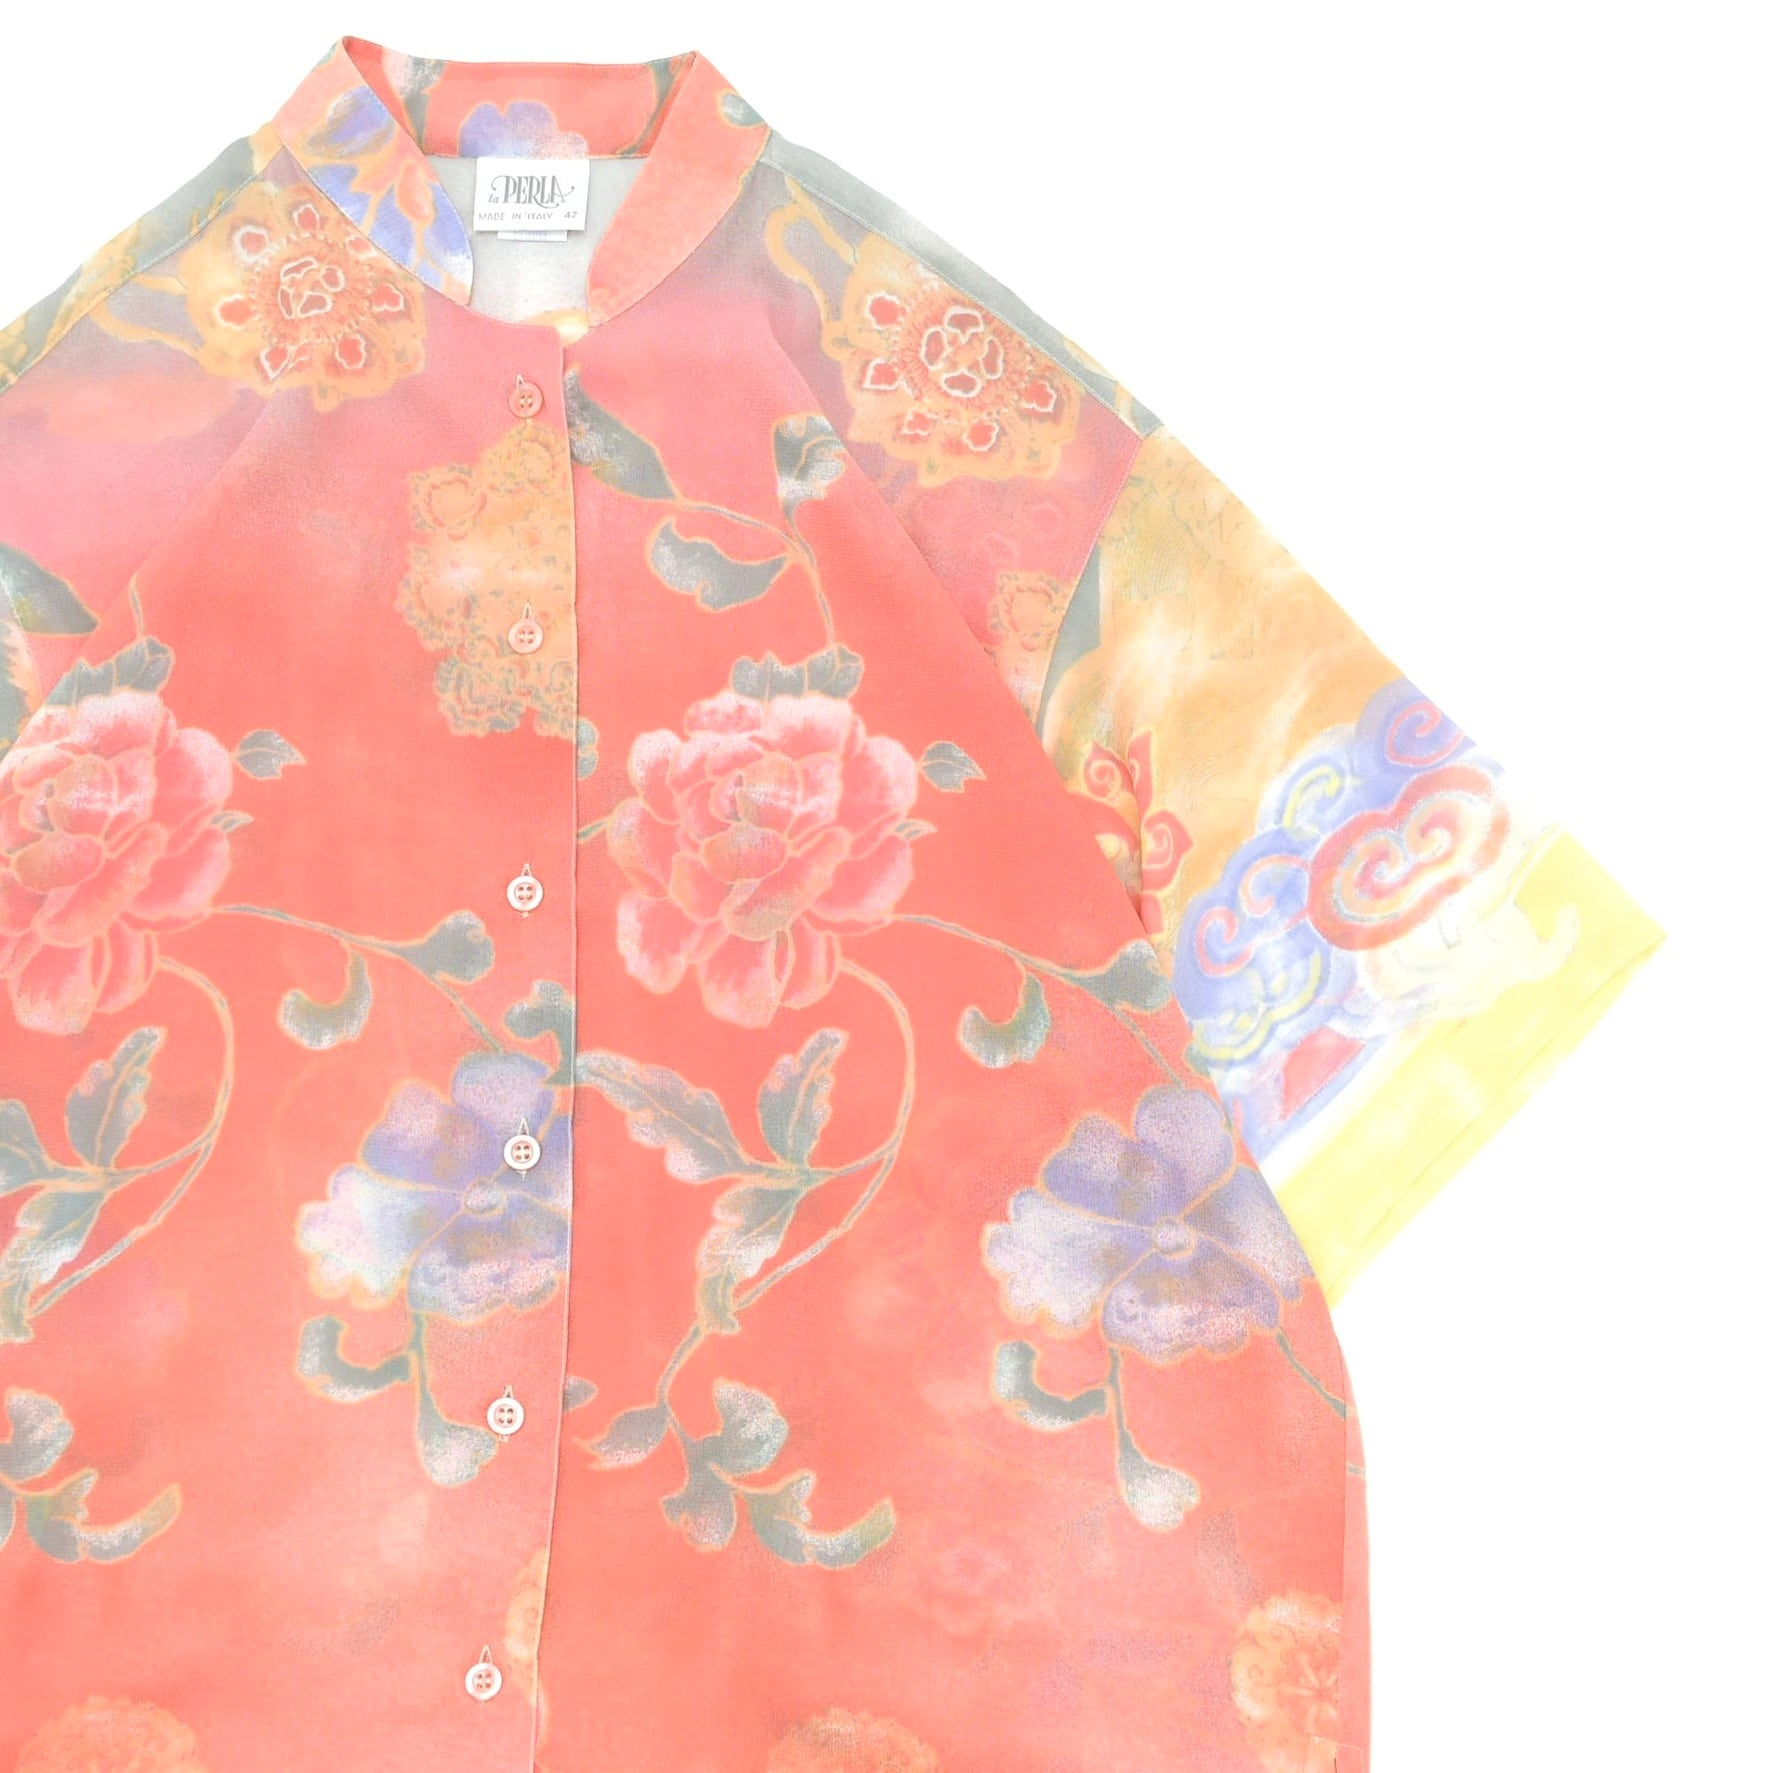 Eur Vtg la PERLA exotic pattern long shirt Made in ITALY